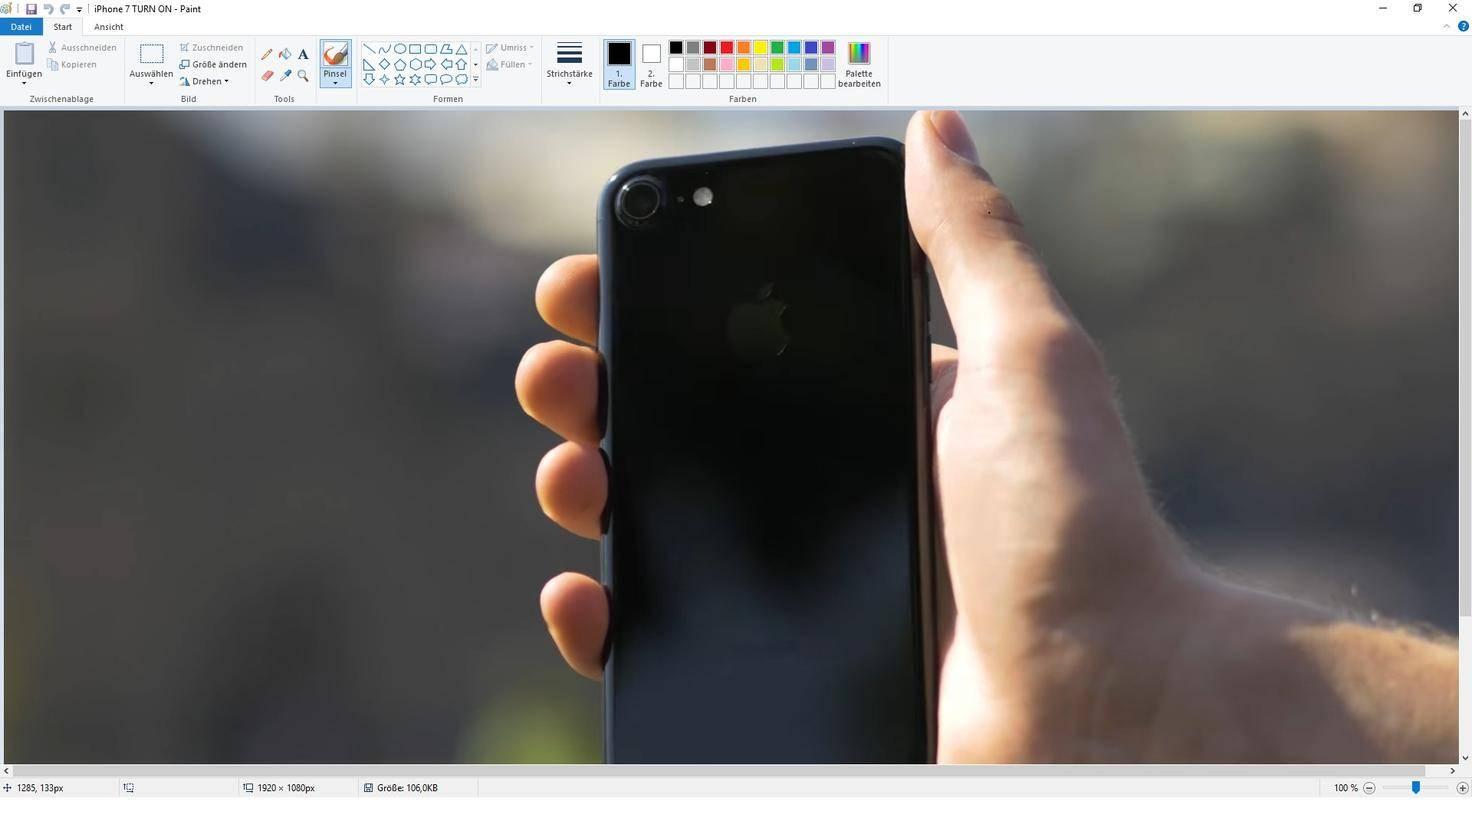 Windows 10 Paint